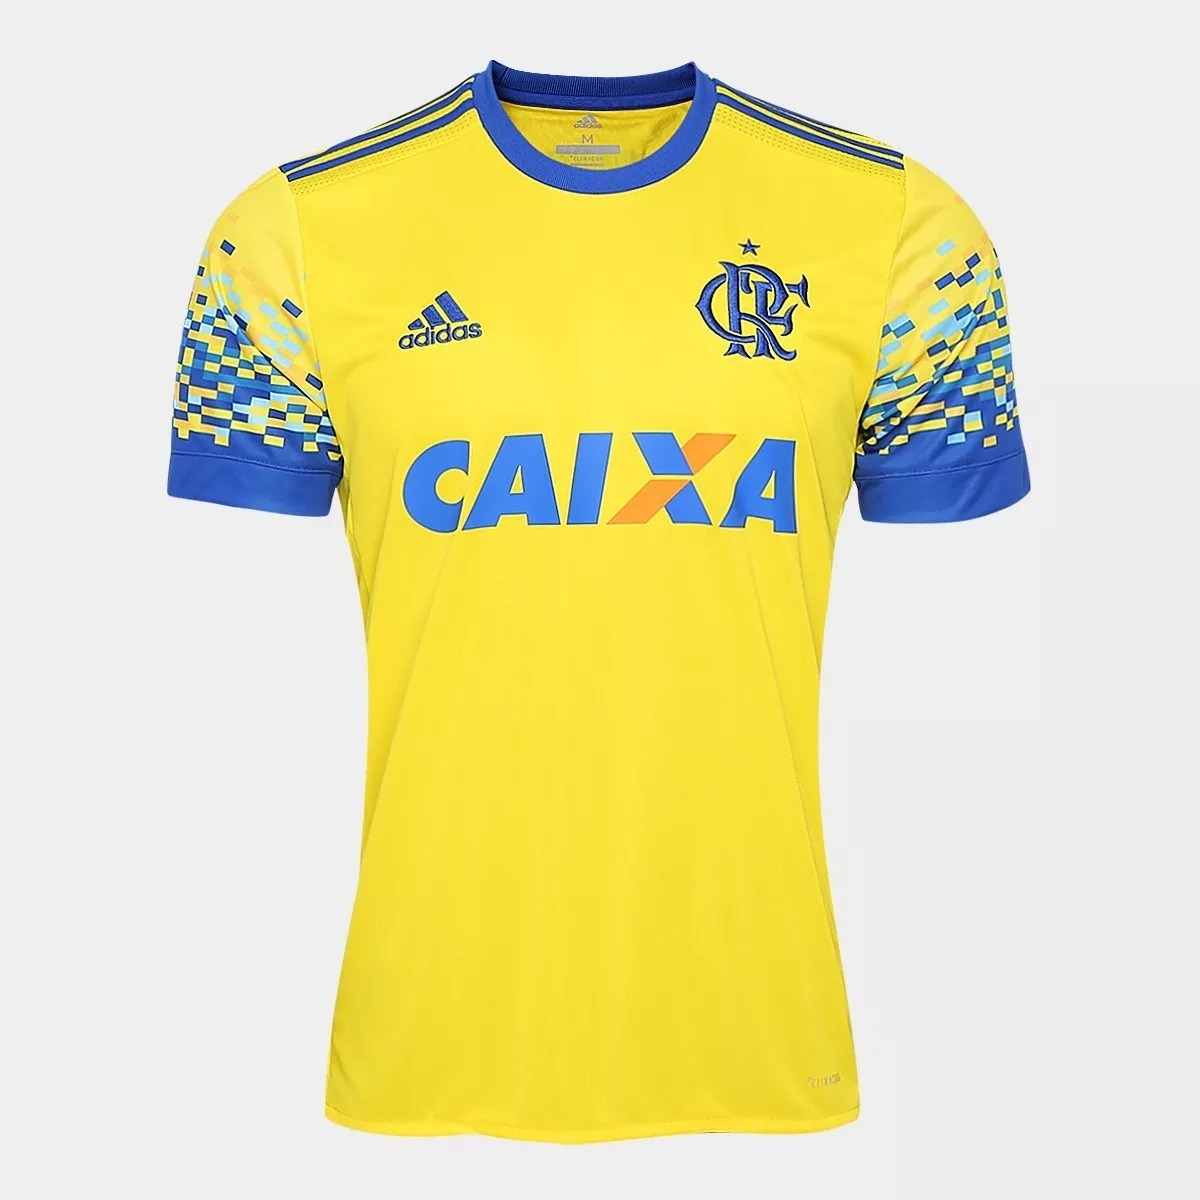 camisa flamengo iii 17 18 s nº torcedor adidas masculina. Carregando zoom. a05da3dc17b